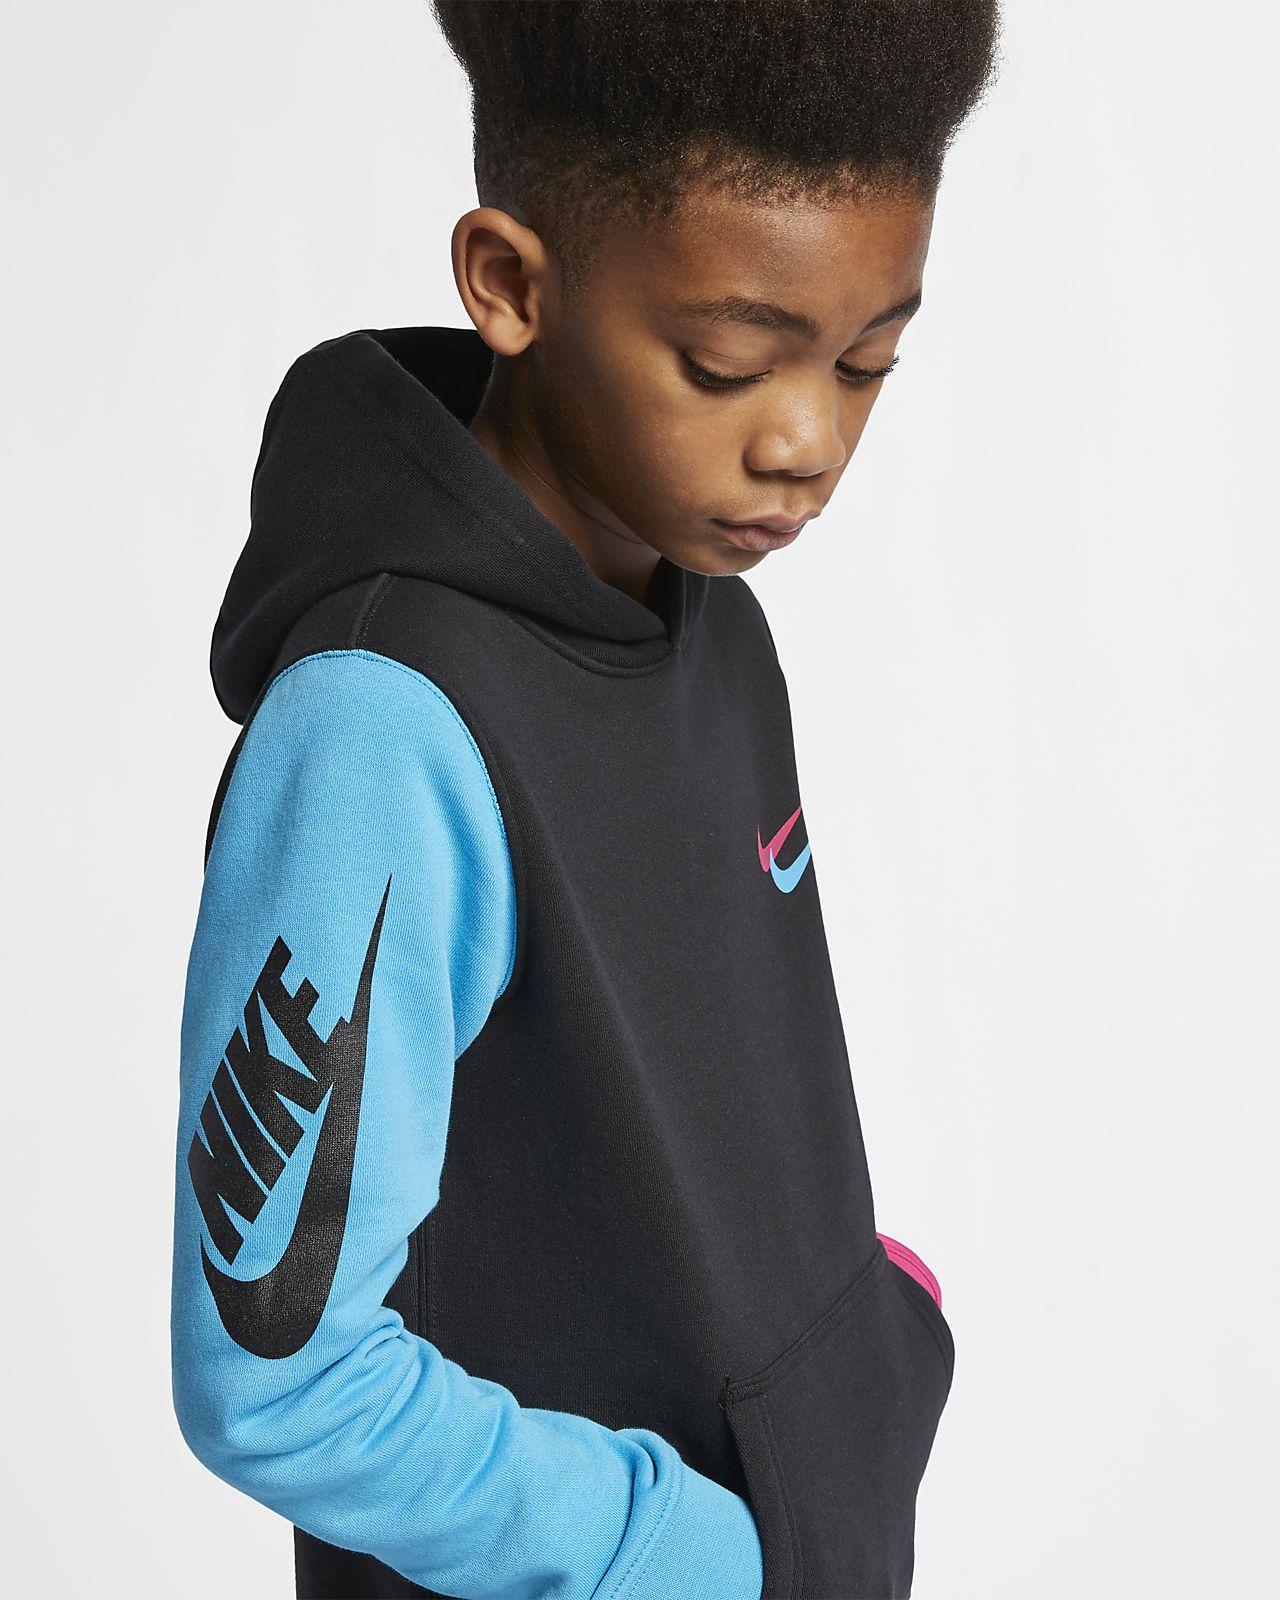 4b5d4ffb50d7 Nike Sportswear Club Fleece Big Kids  (Boys ) Pullover Hoodie. Nike.com